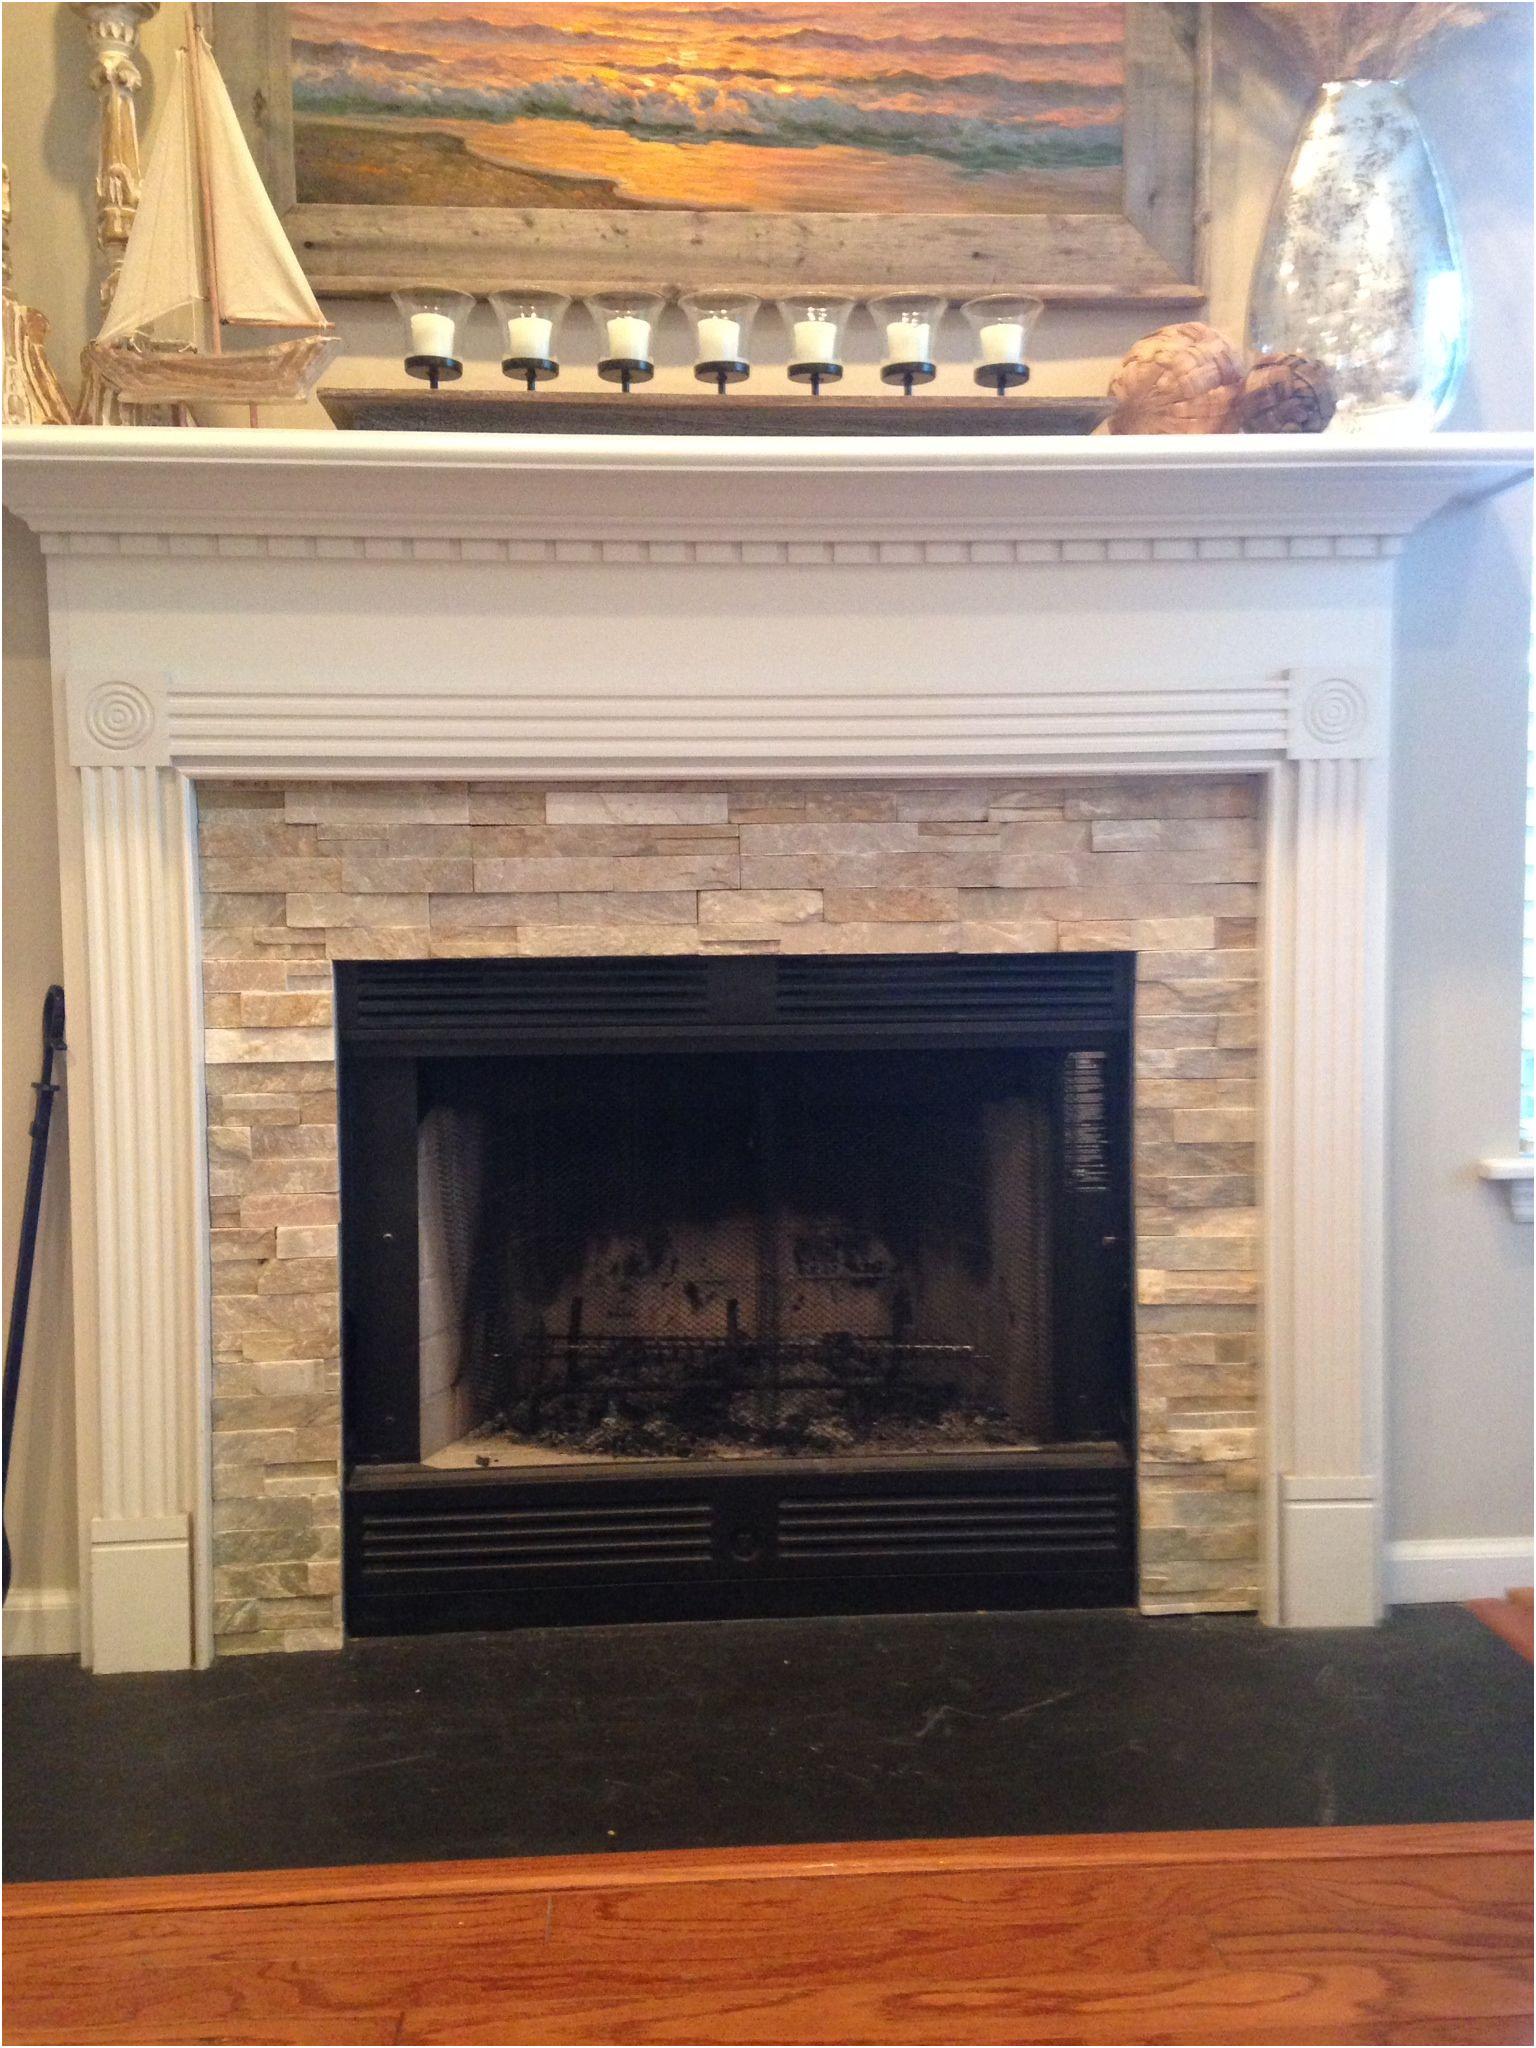 Remodel Fireplace Ideas Best Of Fireplace Idea Mantel Wainscoting Design Craftsman